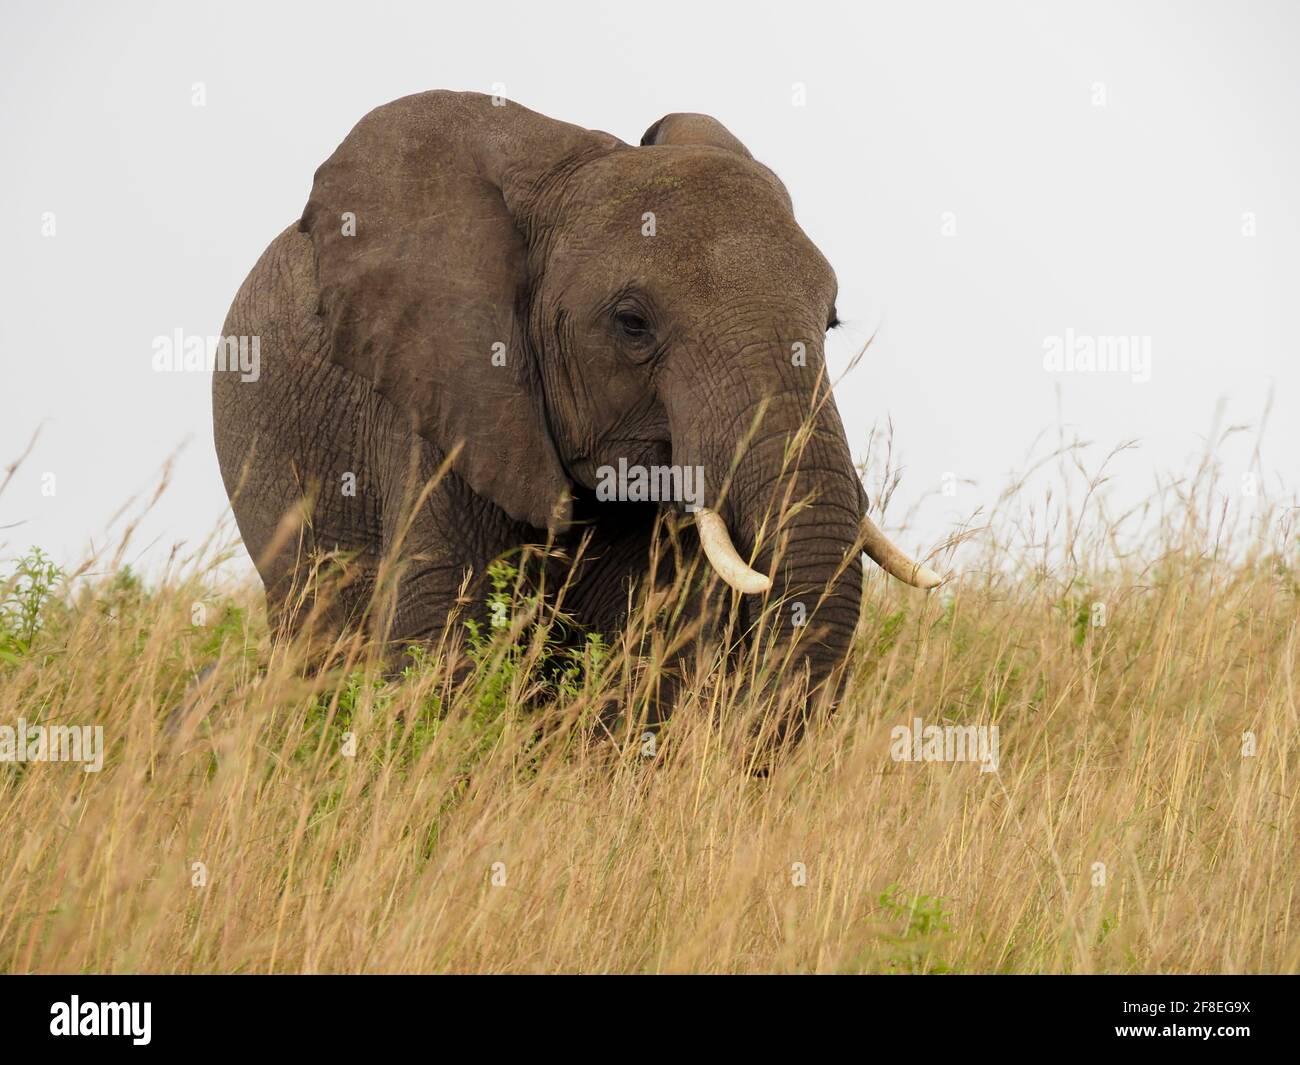 Masaai Mara, Kenya, Africa - February 26, 2020: African elephants in tall grass on Safari, Masaai Mara Game Reserve Stock Photo